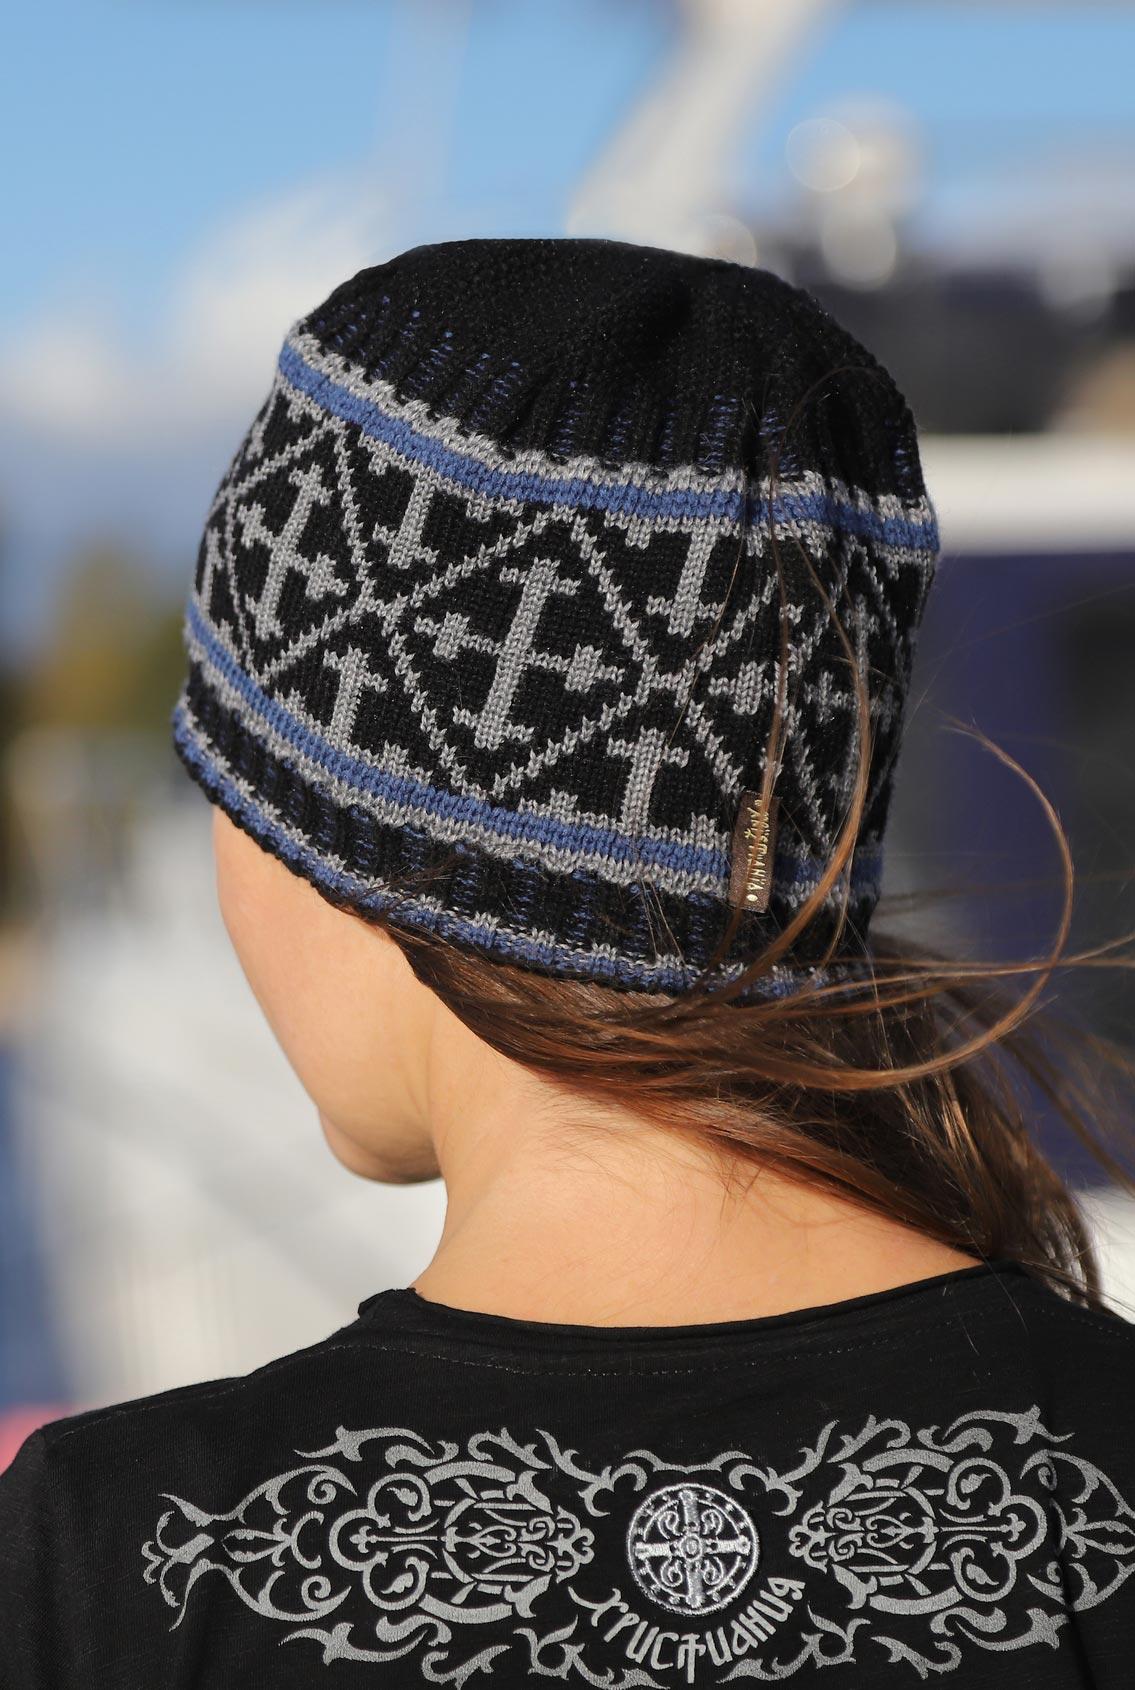 хевсурская шапка, the last vendetta hat